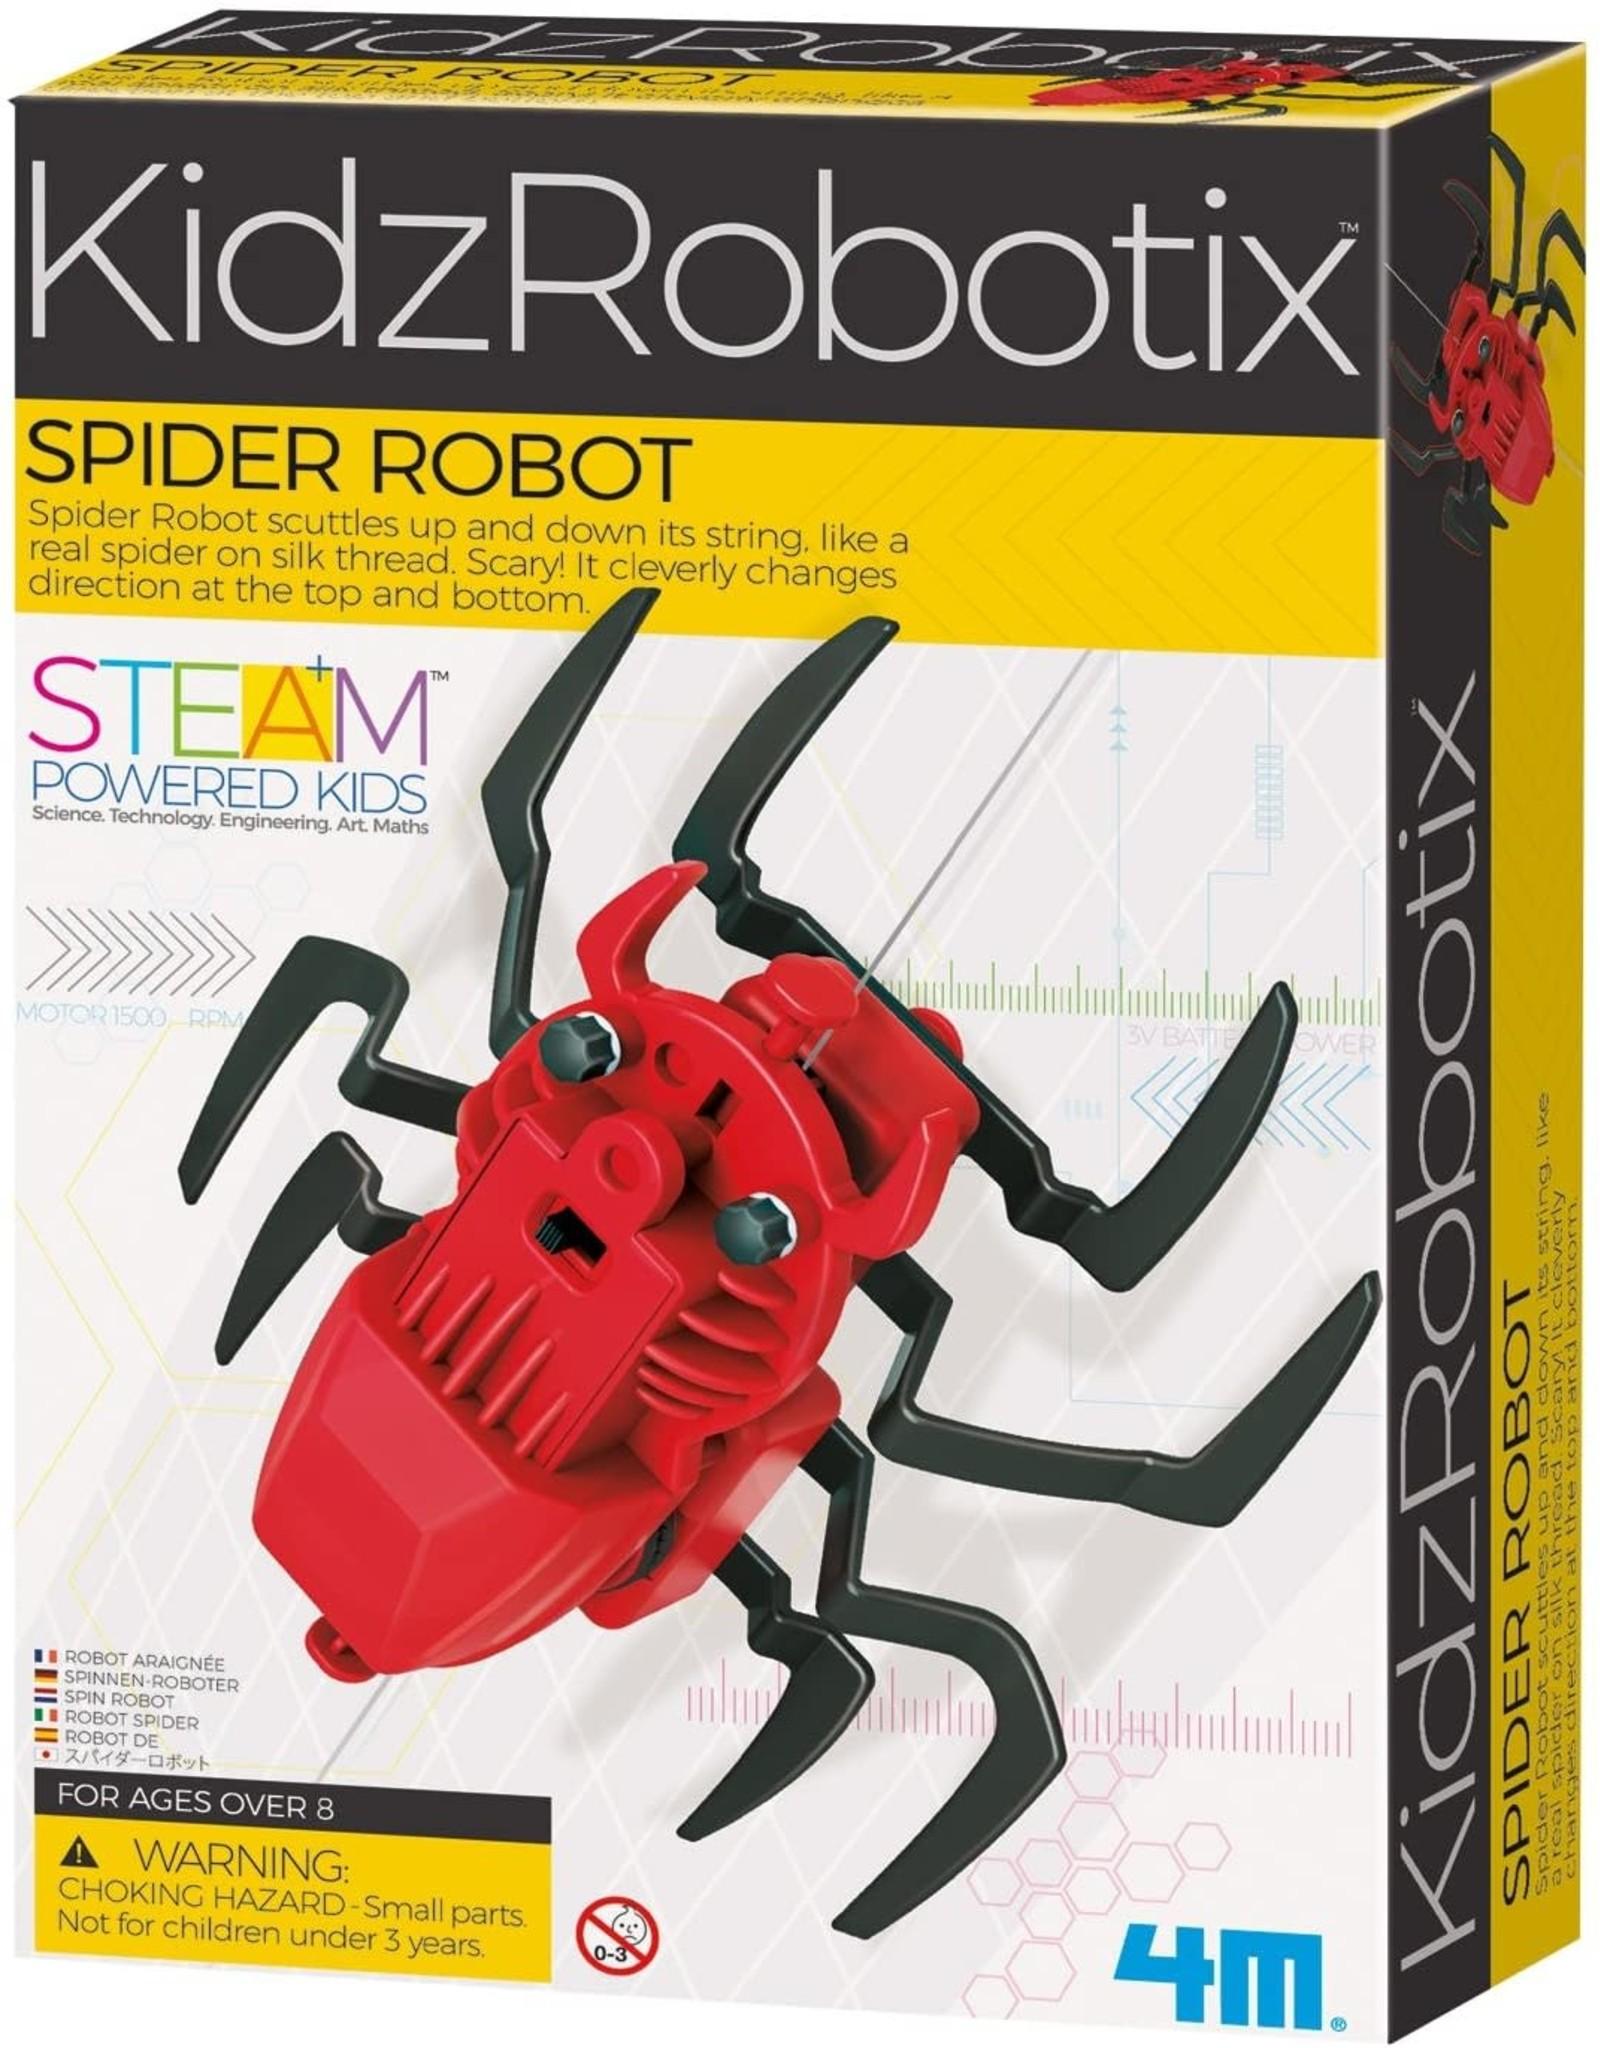 4M Kidz Robotics - Spider